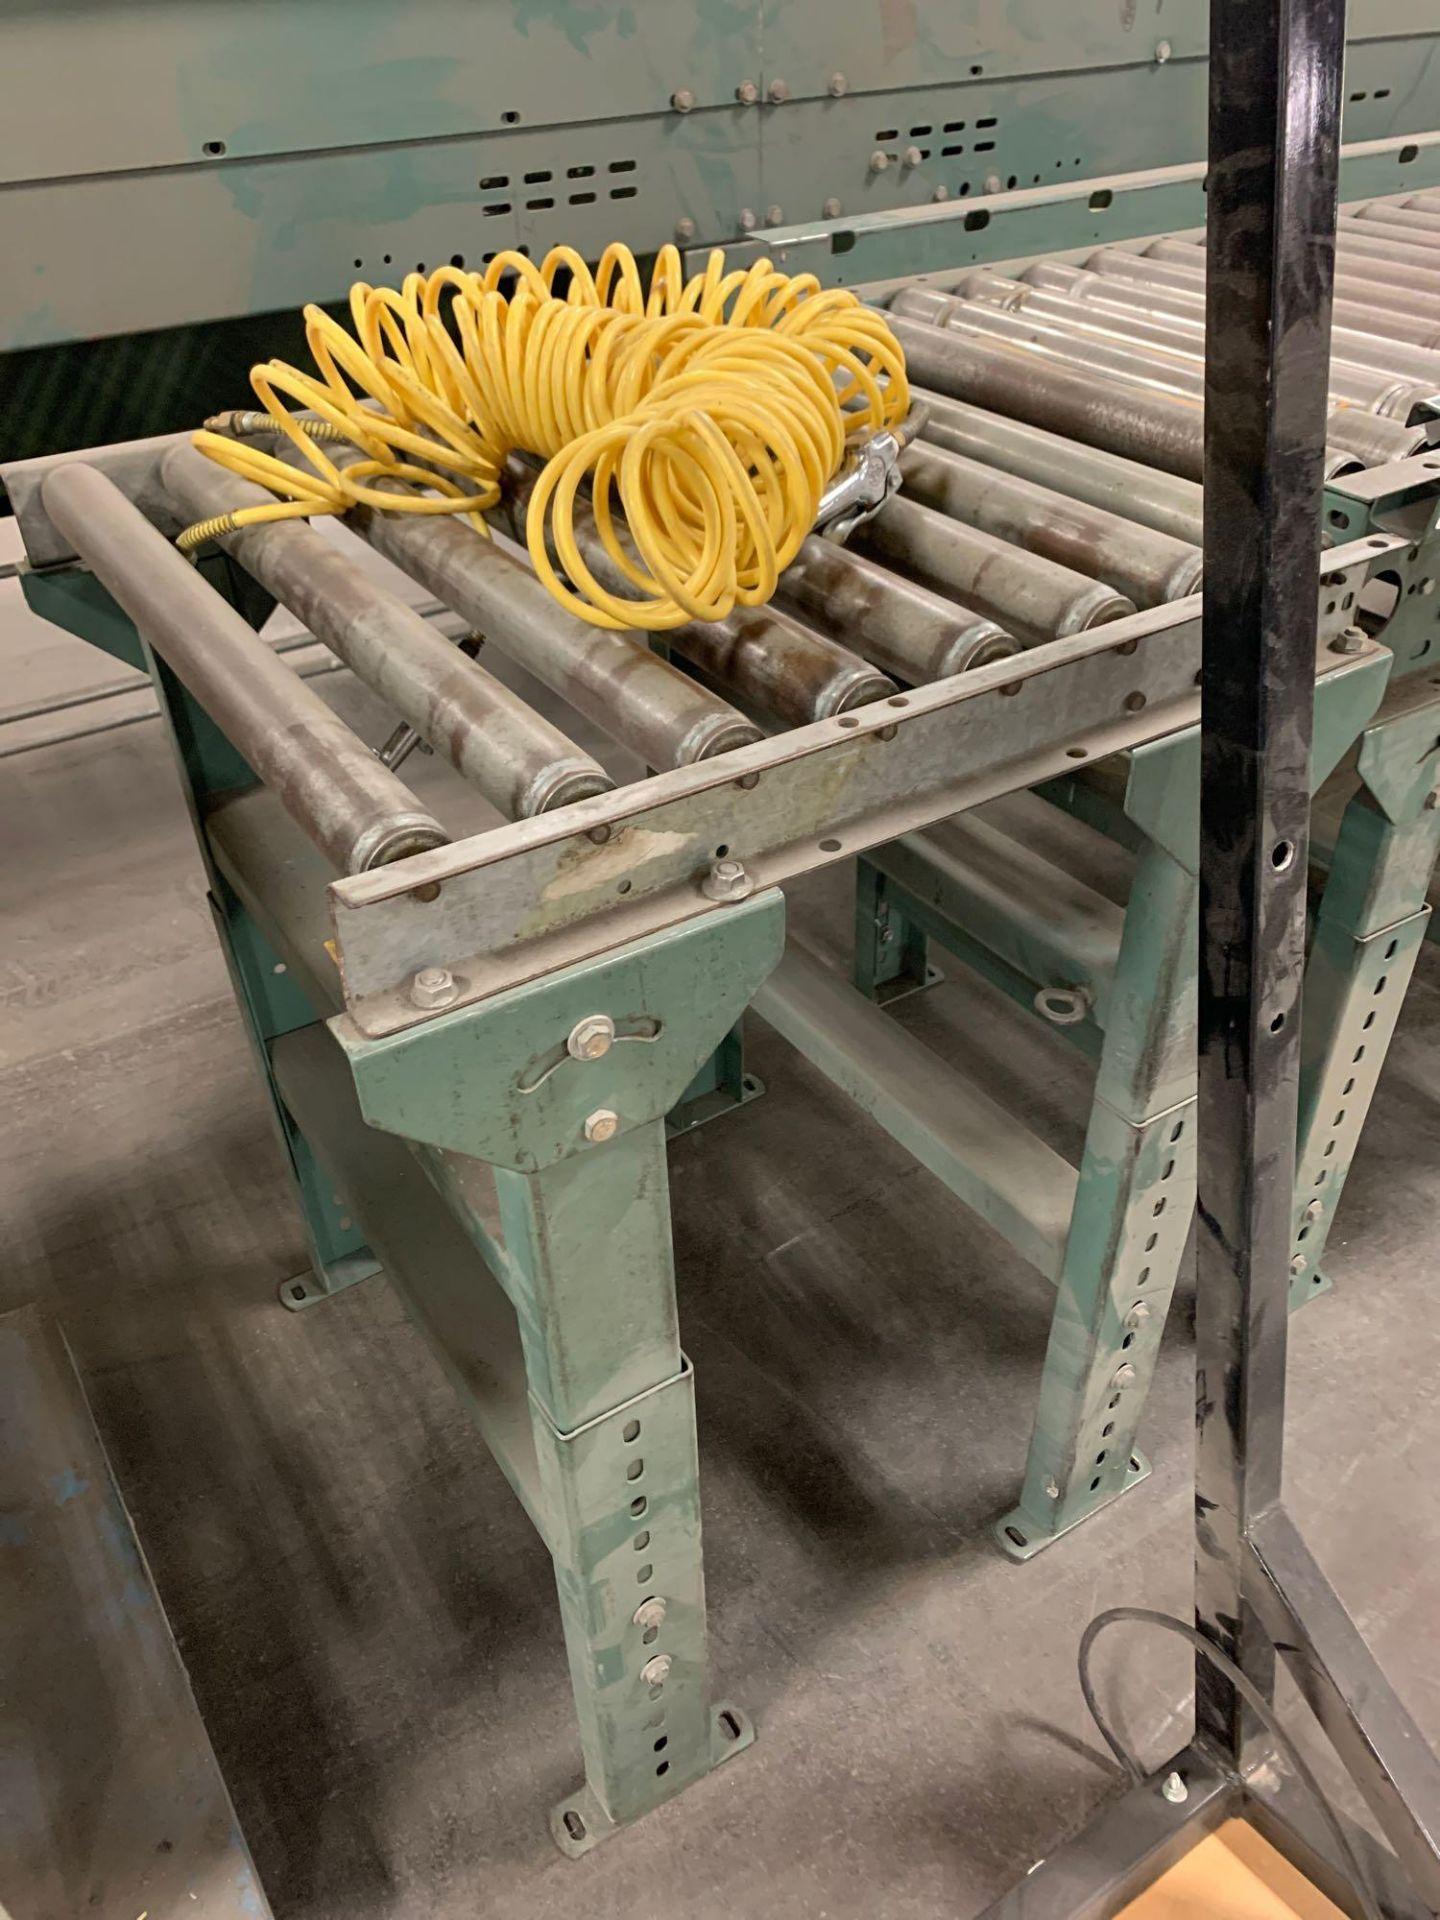 Hytrol 24' Conveyor Line Section - Image 6 of 6